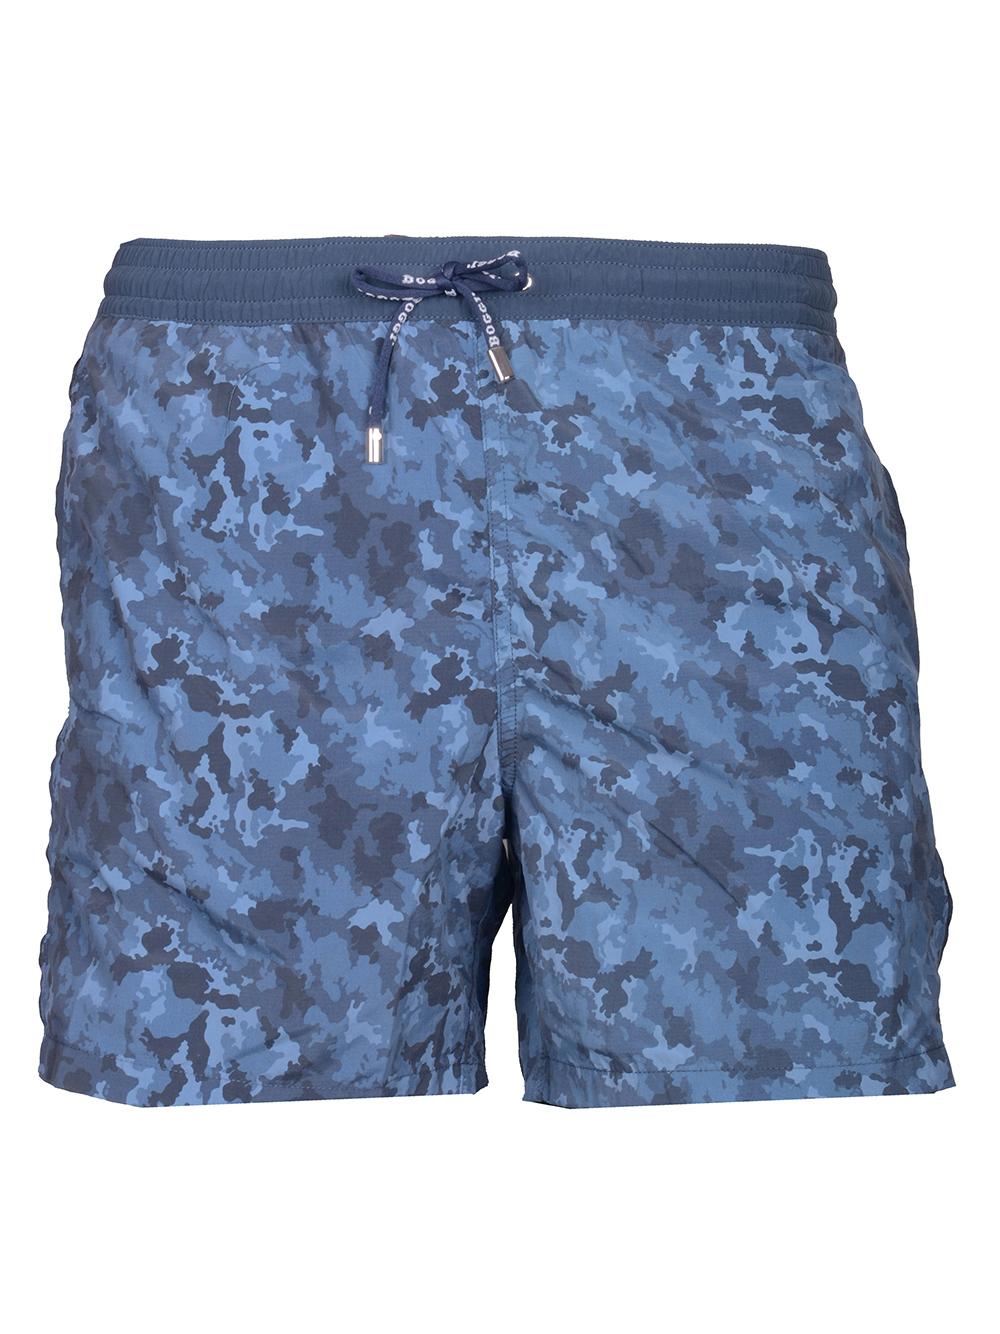 BOGGI Μαγιό shorts B018P092401 ΜΠΛΕ